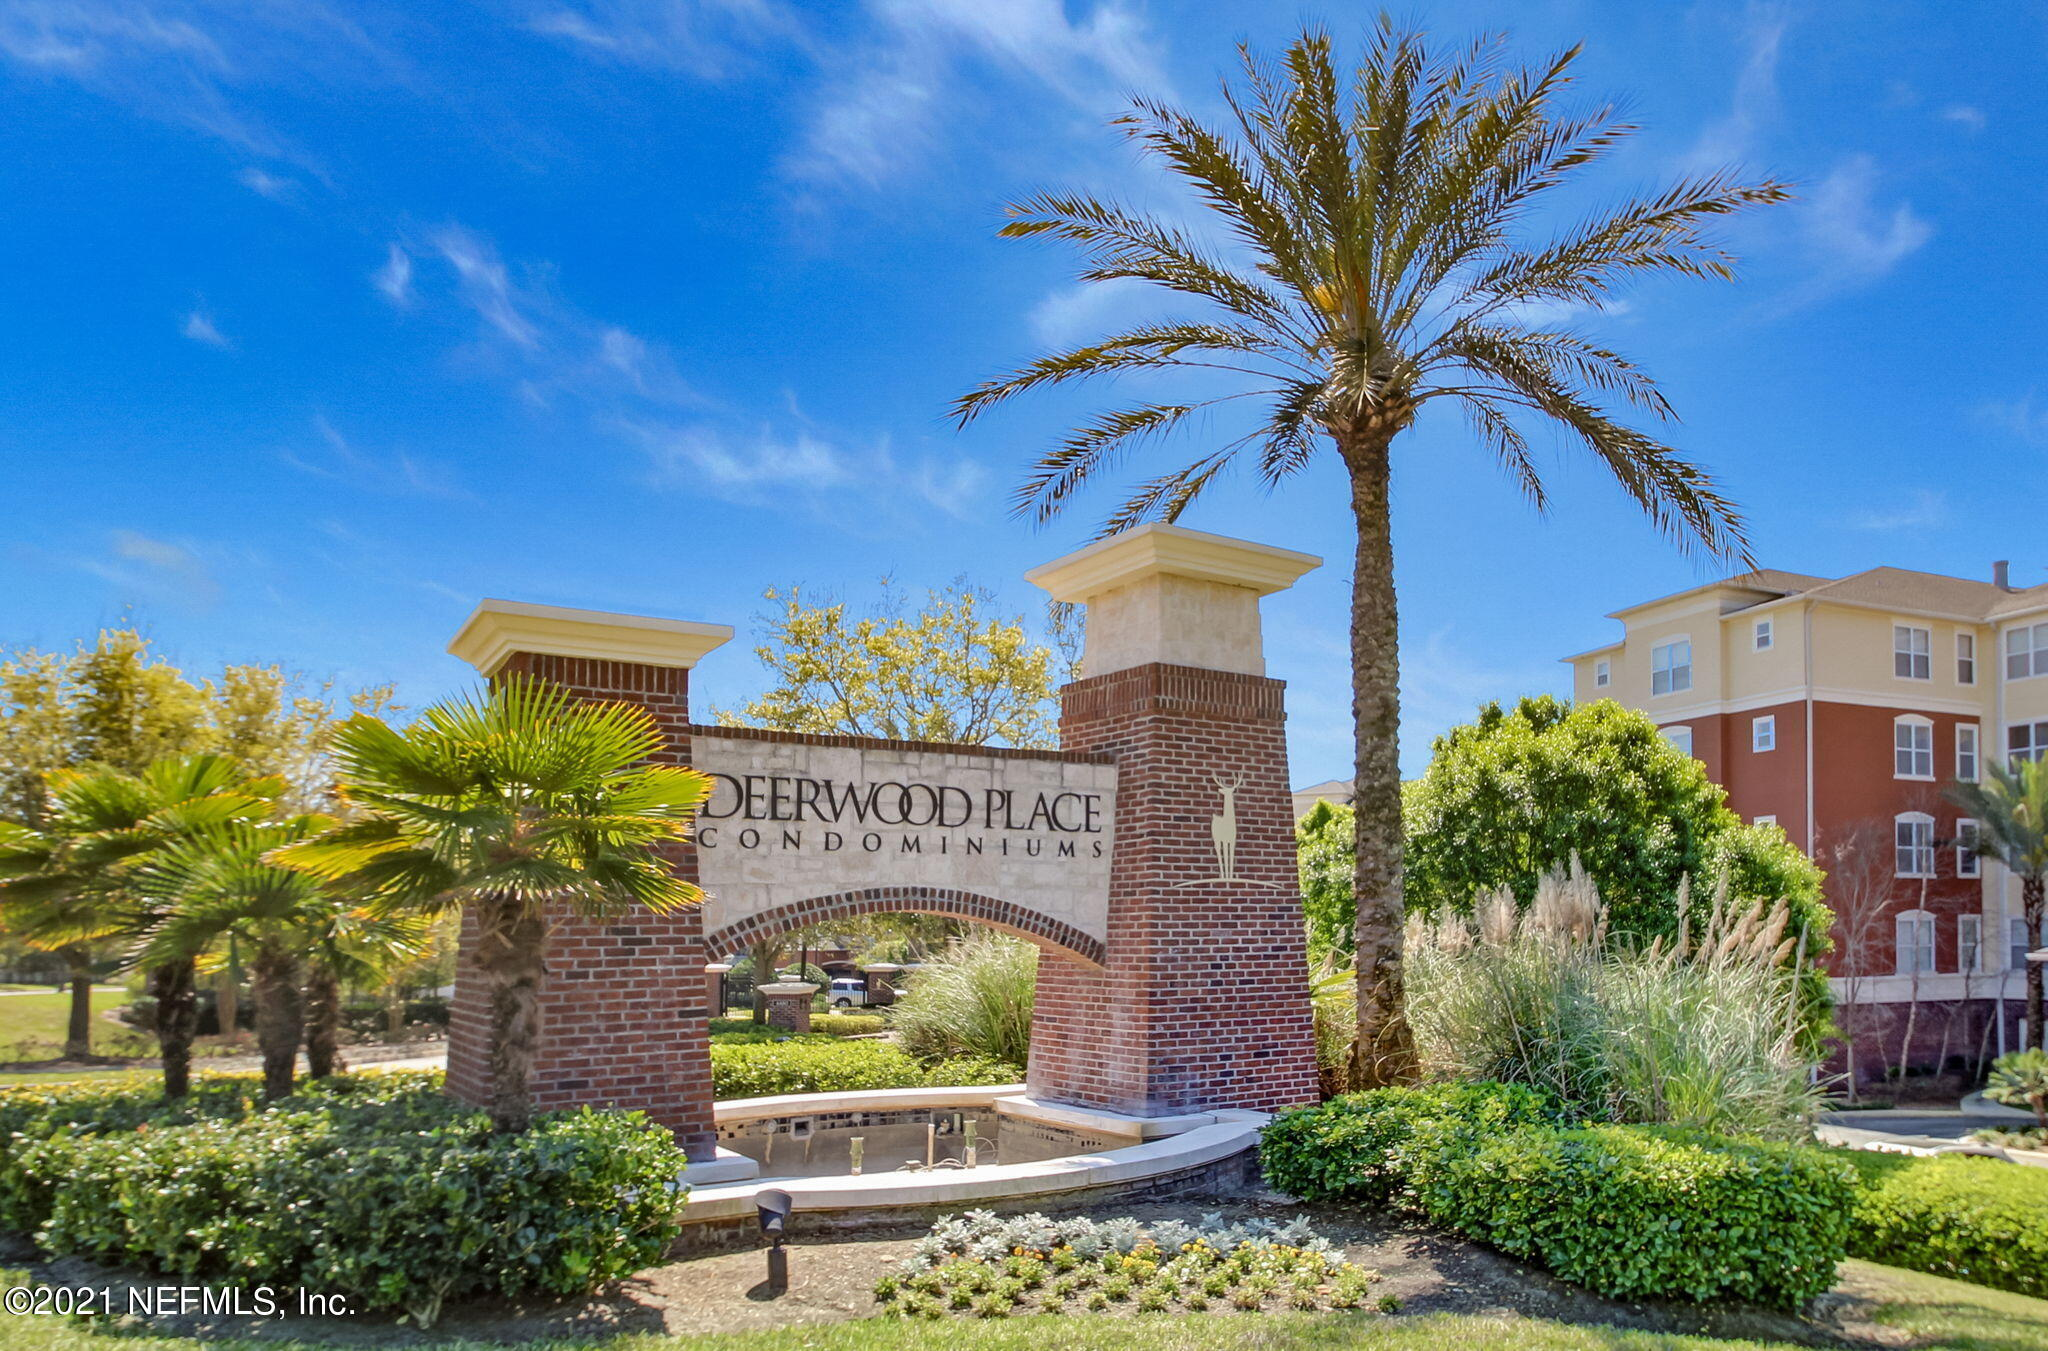 4480 Deerwood Lake Pkwy Jacksonville, Fl 32216